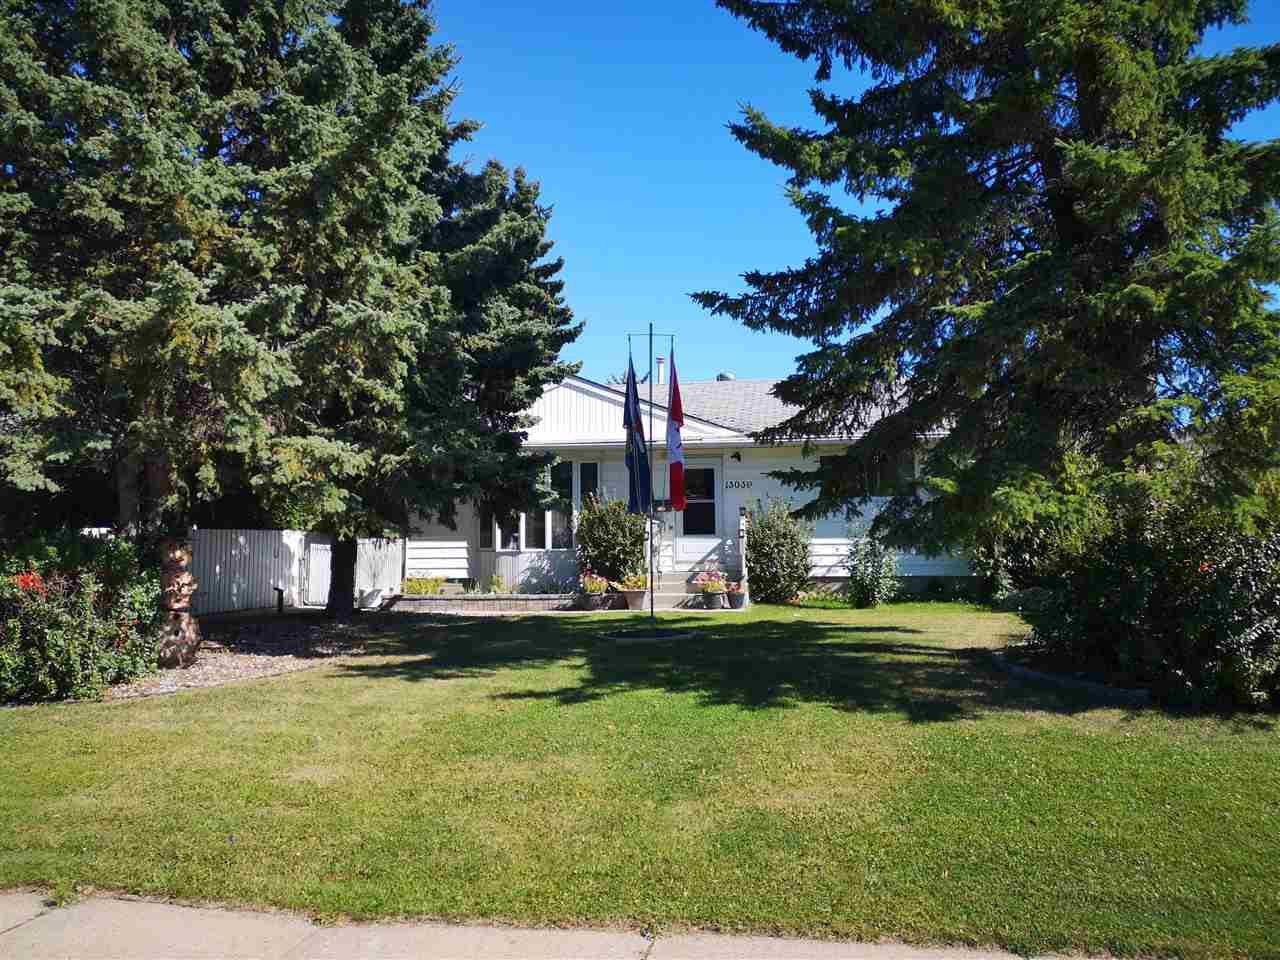 Main Photo: 13039 123 Street in Edmonton: Zone 01 House for sale : MLS®# E4213838